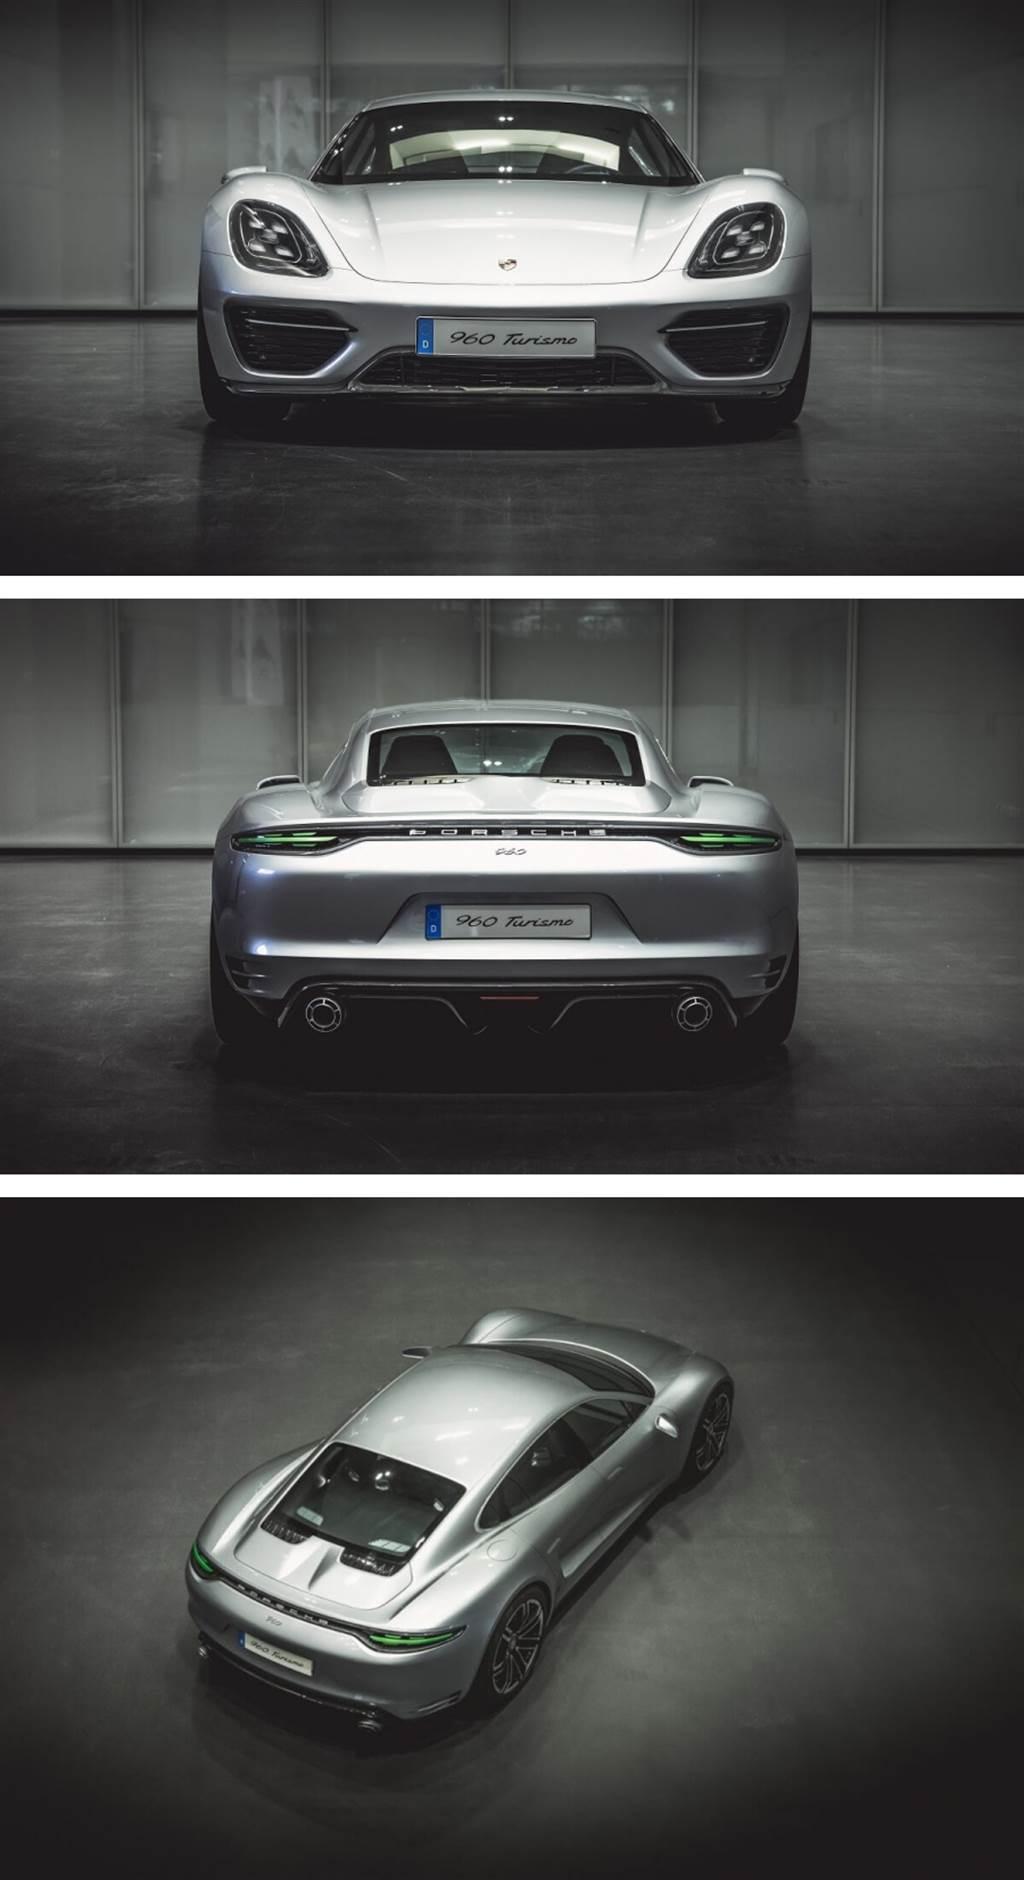 Porsche Vision Turismo(2016)